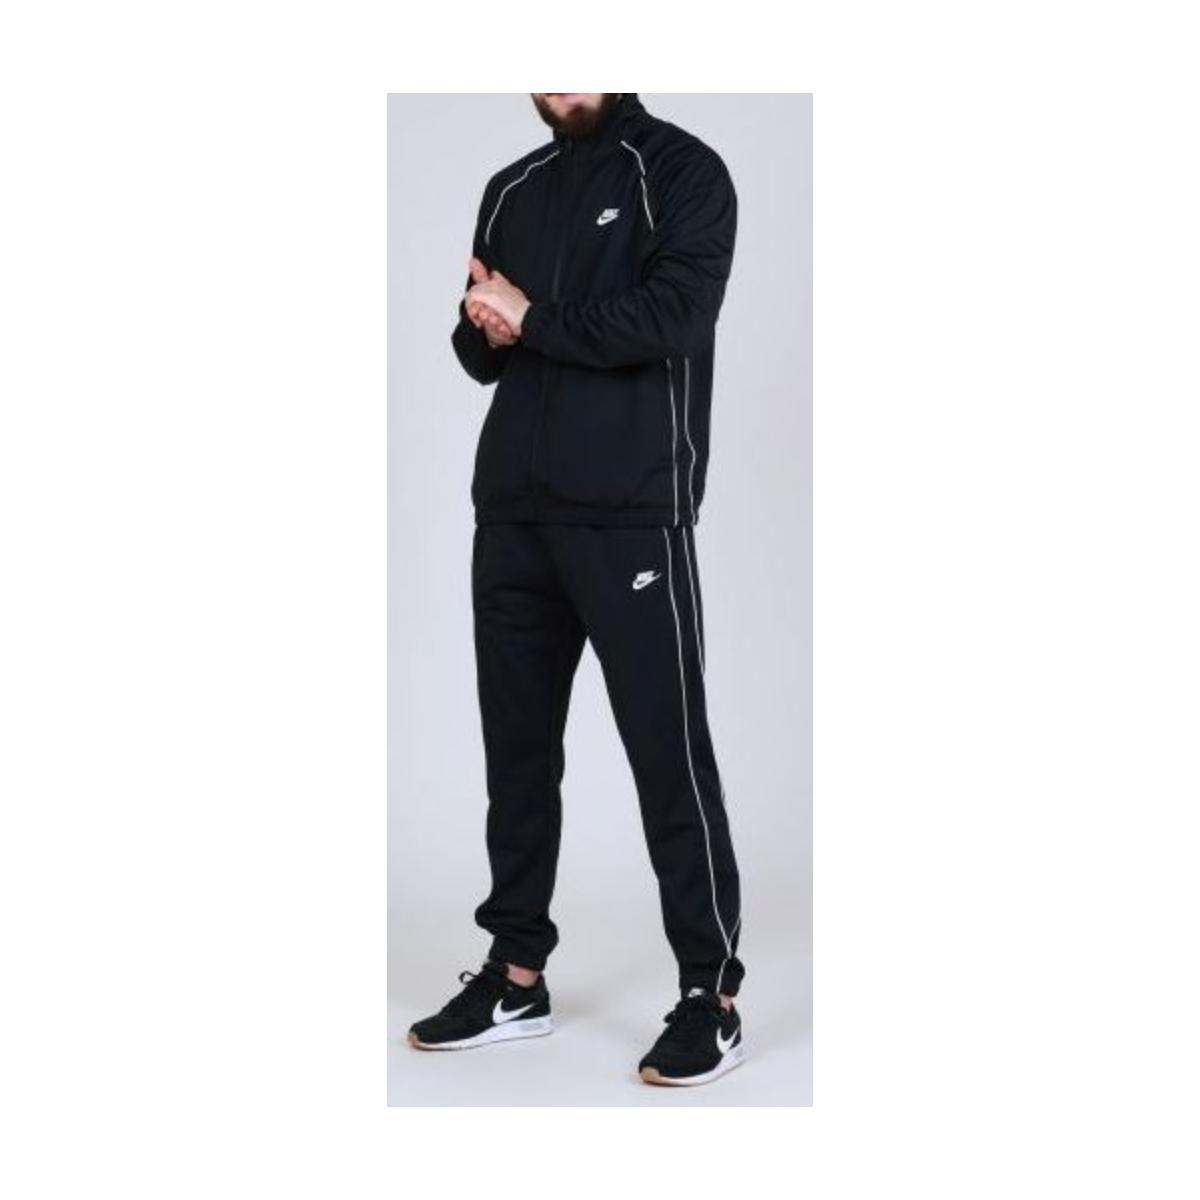 Abrigo Masculino Nike Cz9988-010 Trk Suit Preto